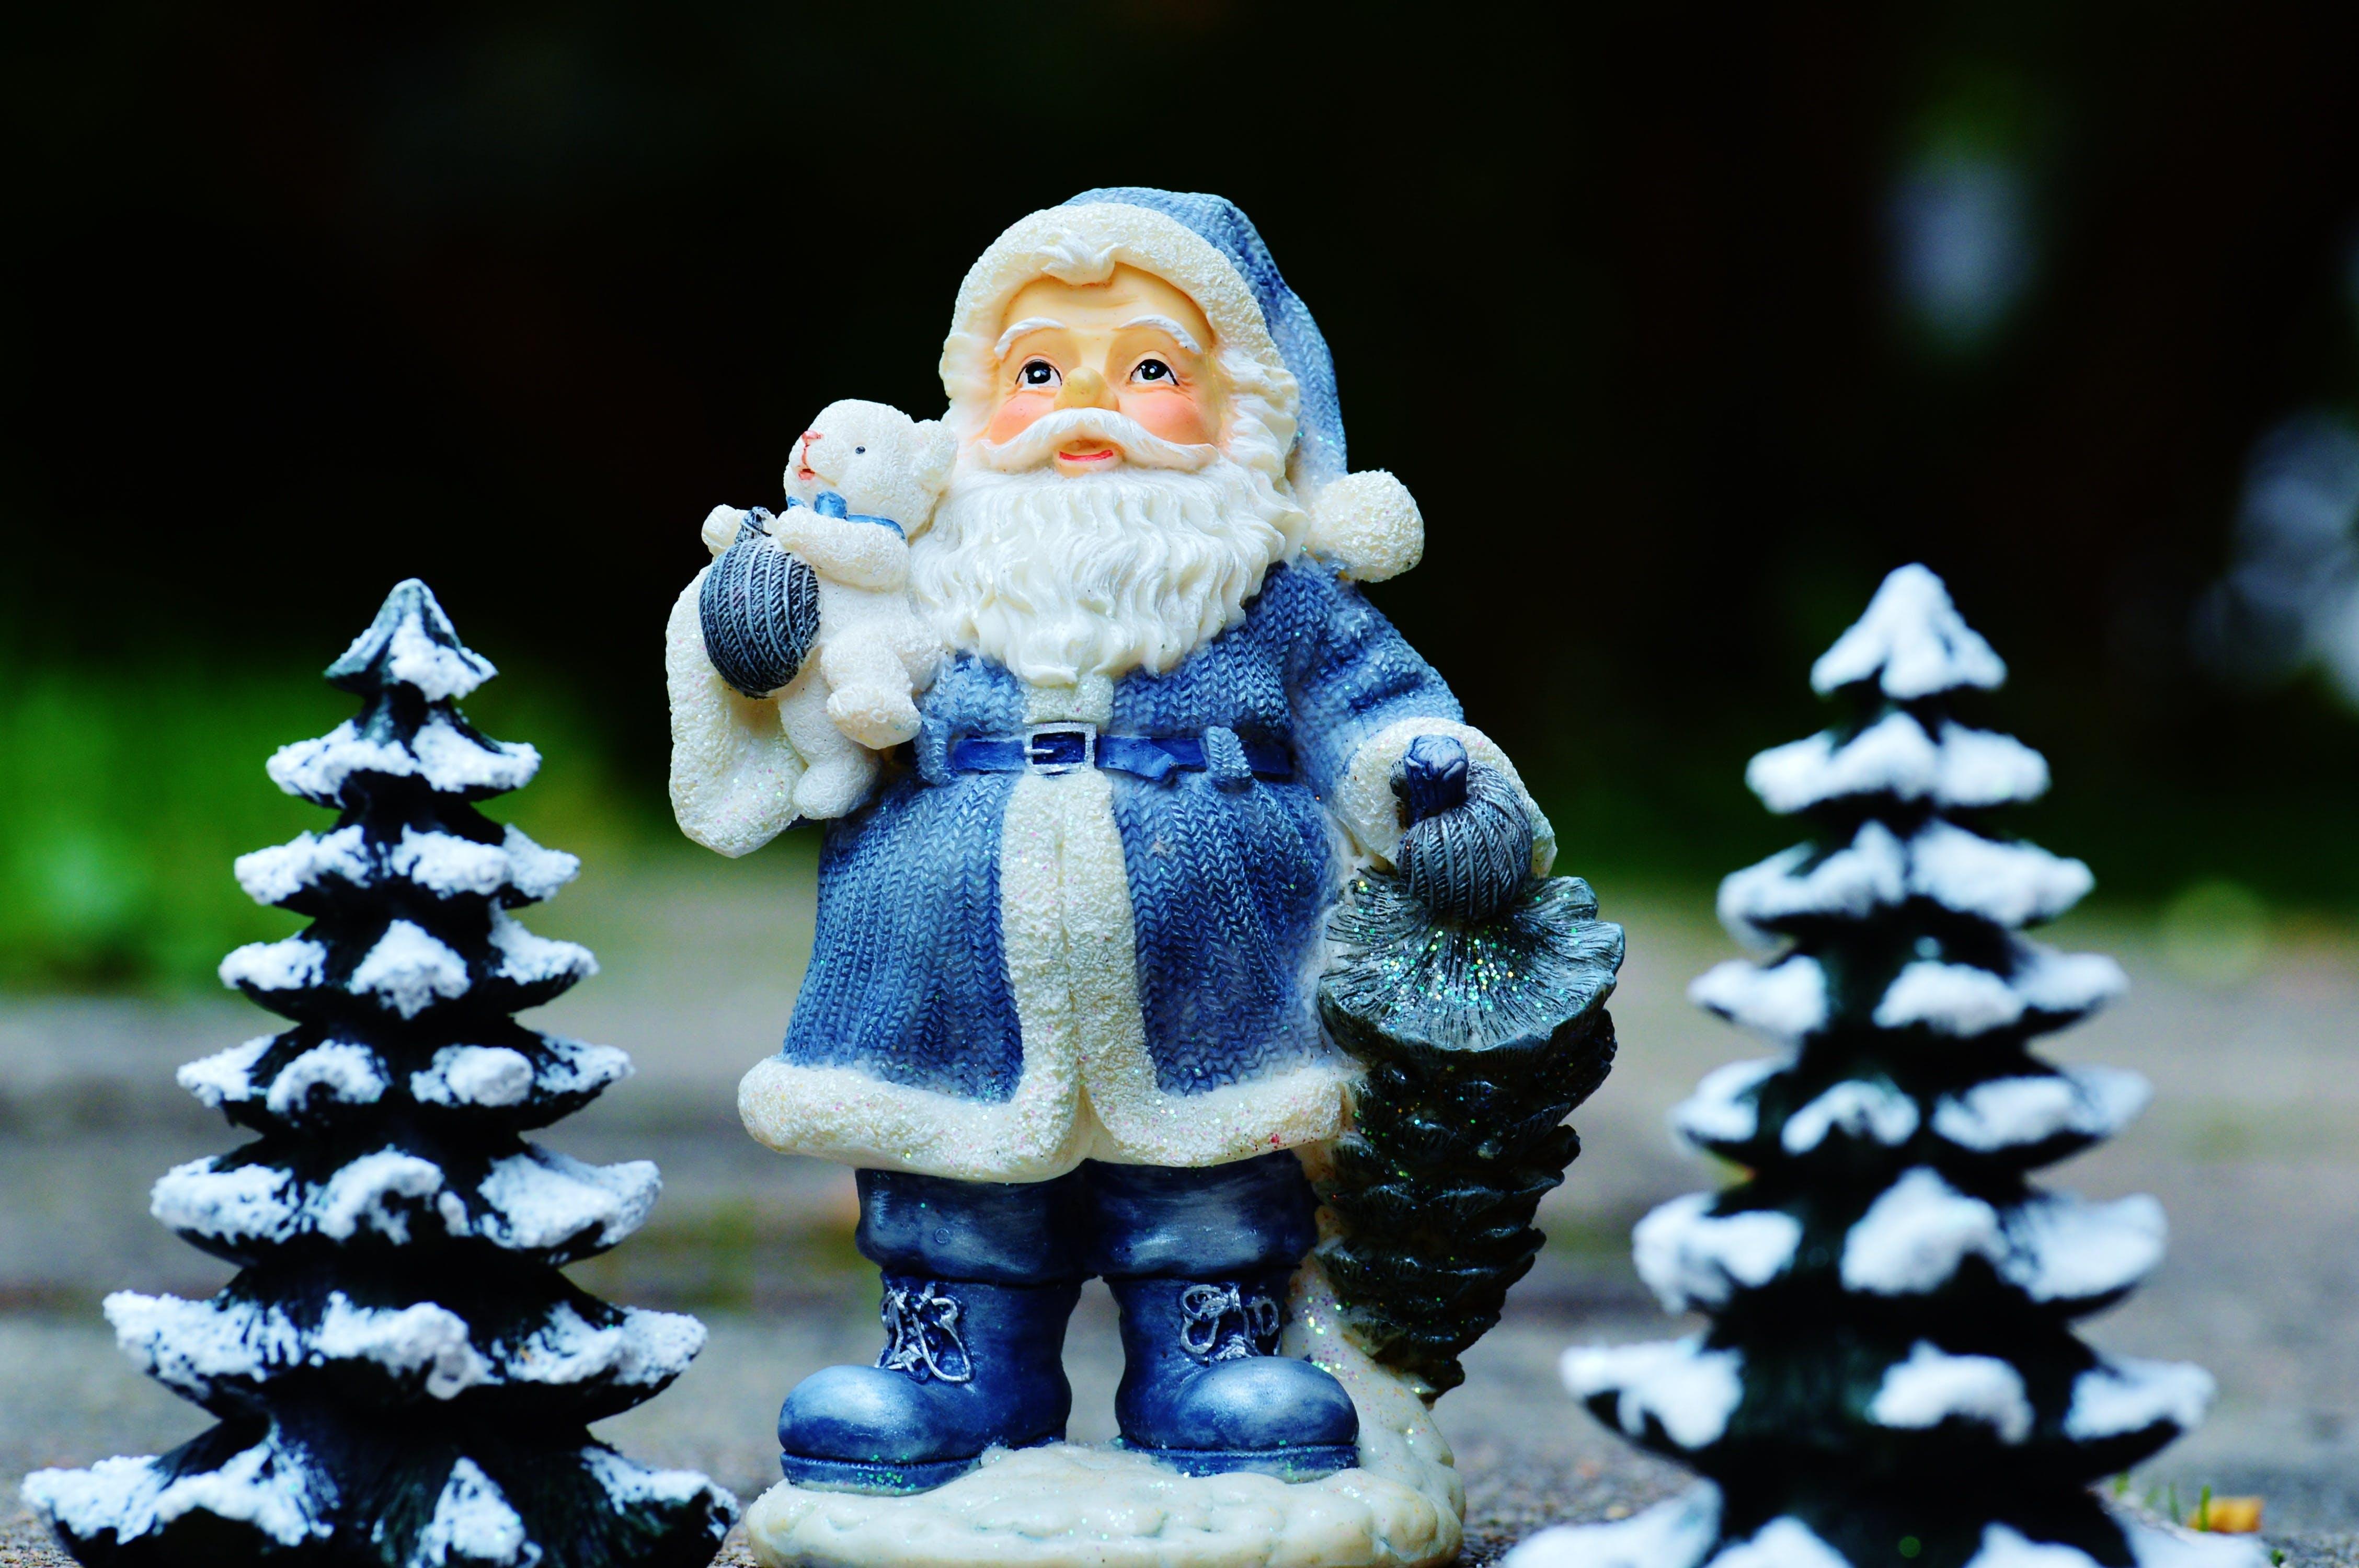 advent, celebrate, christmas